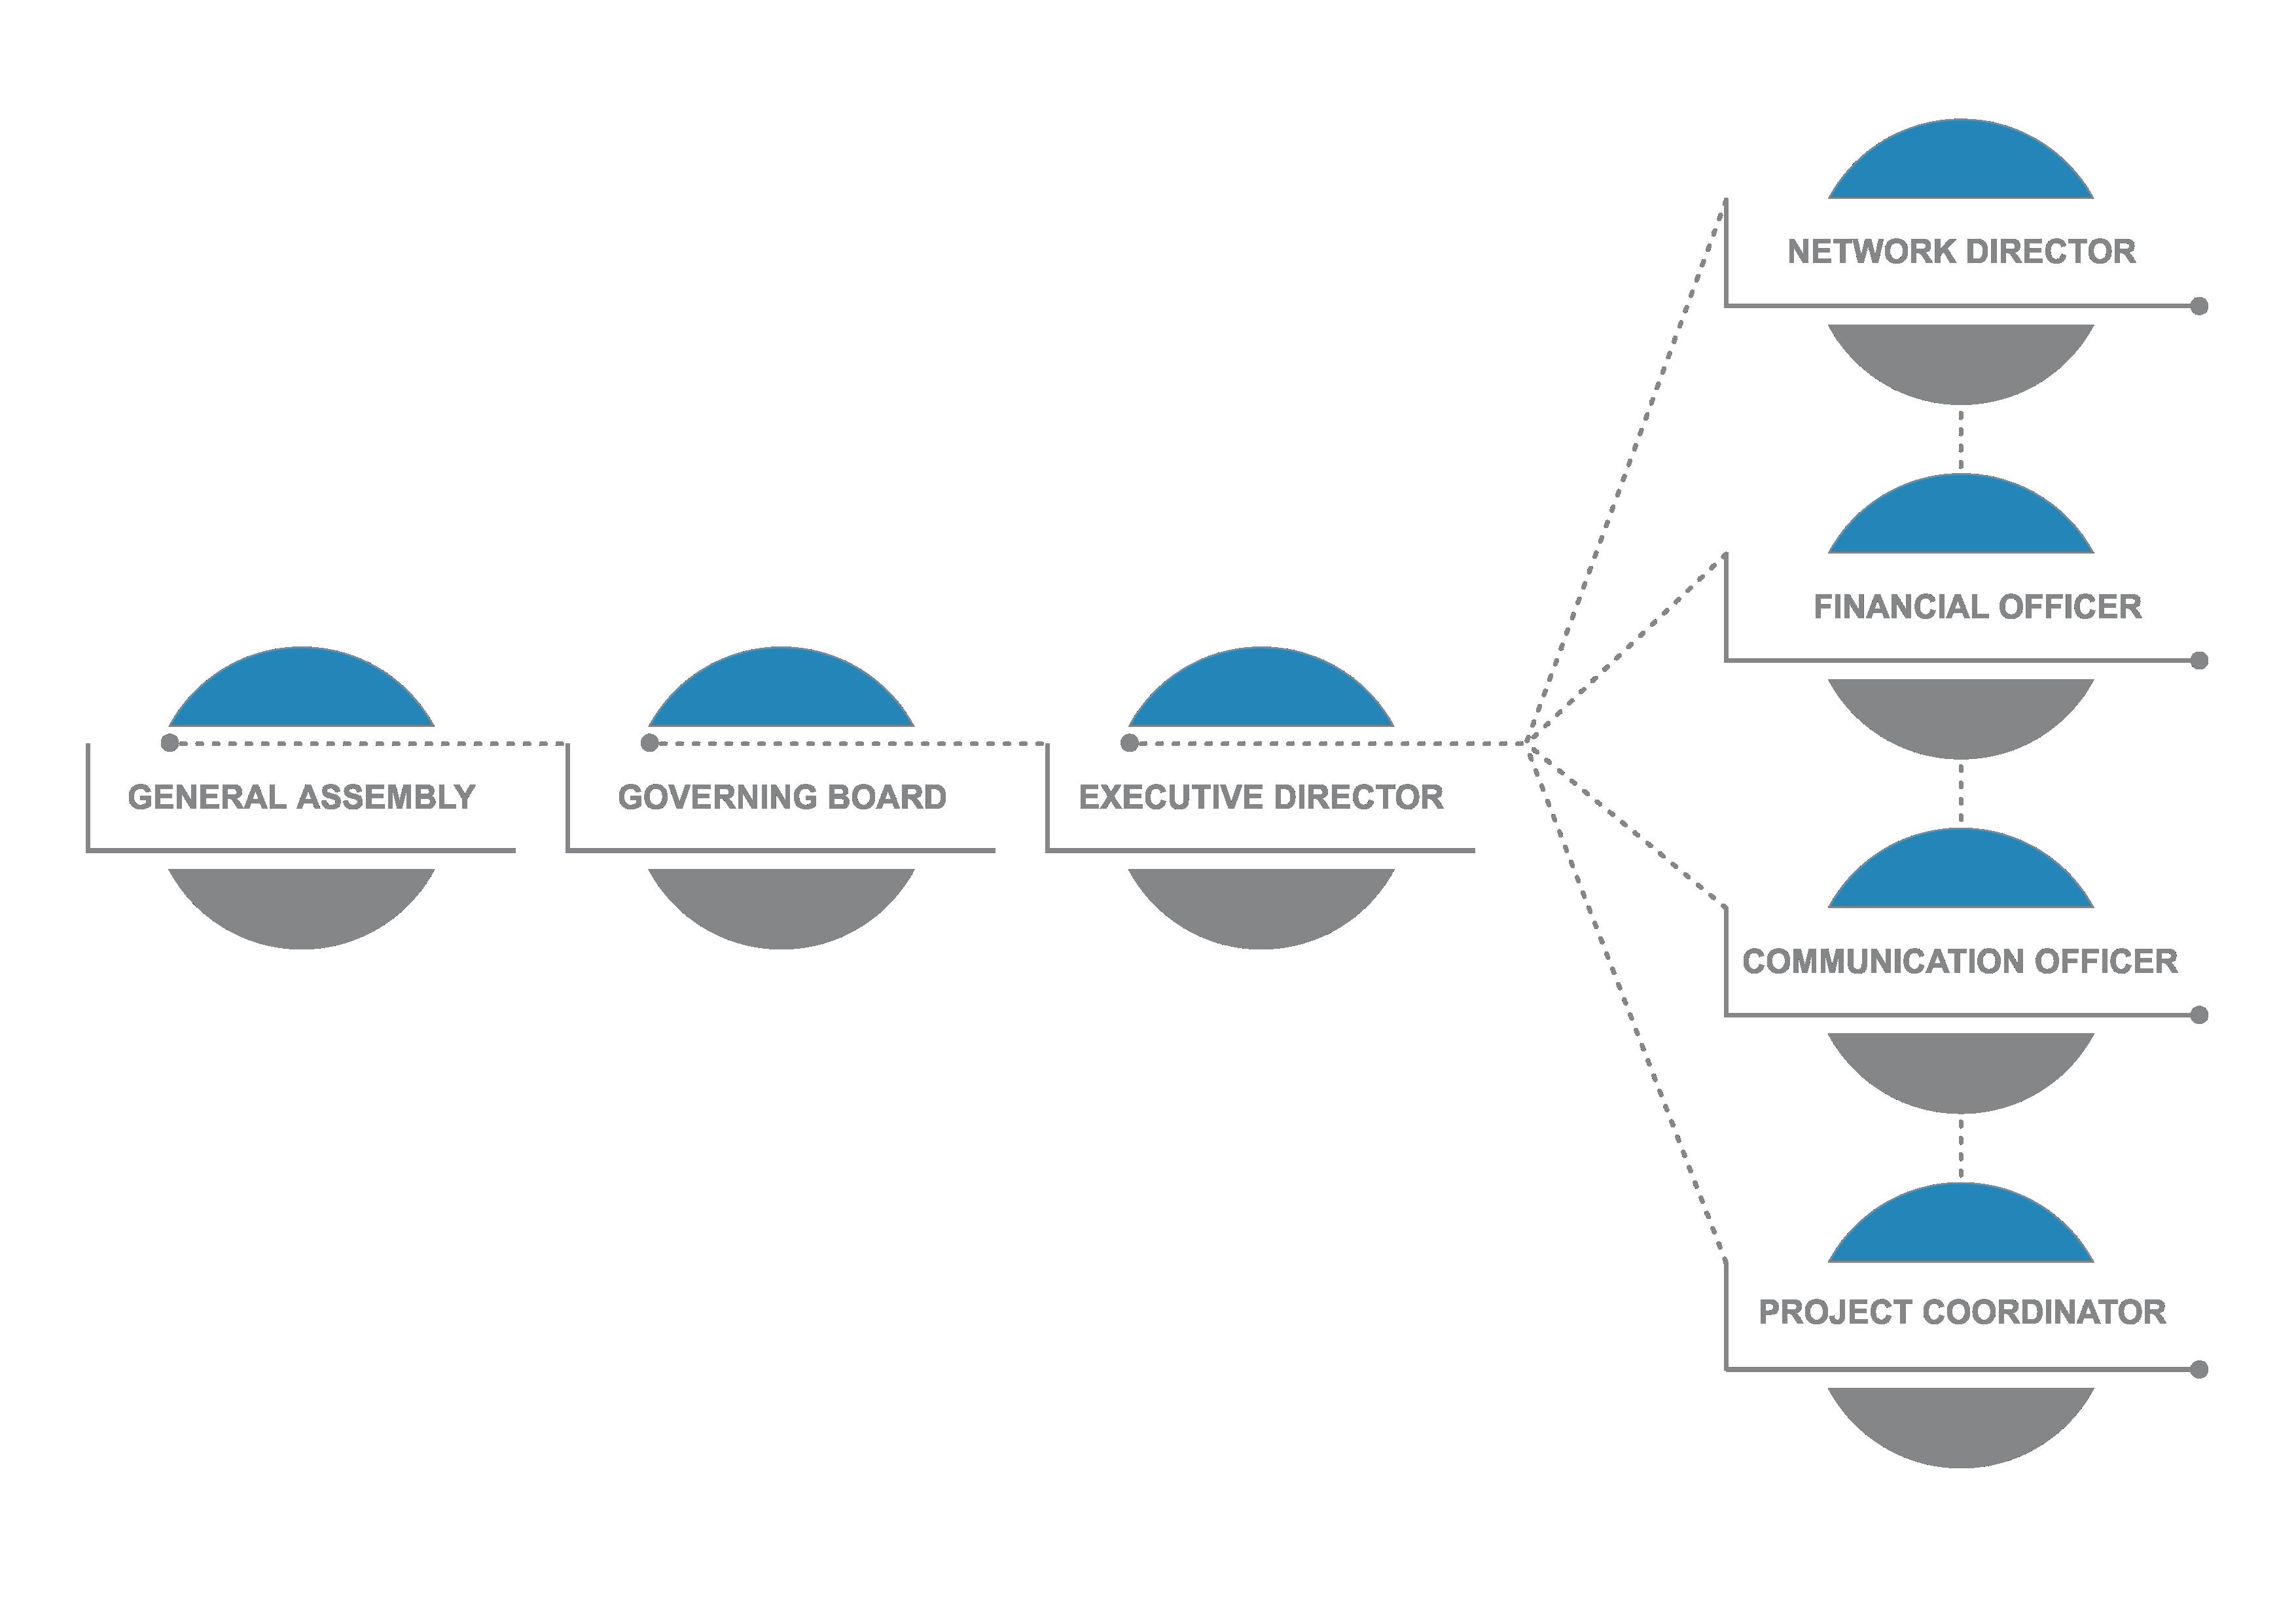 organization-structure-new-02